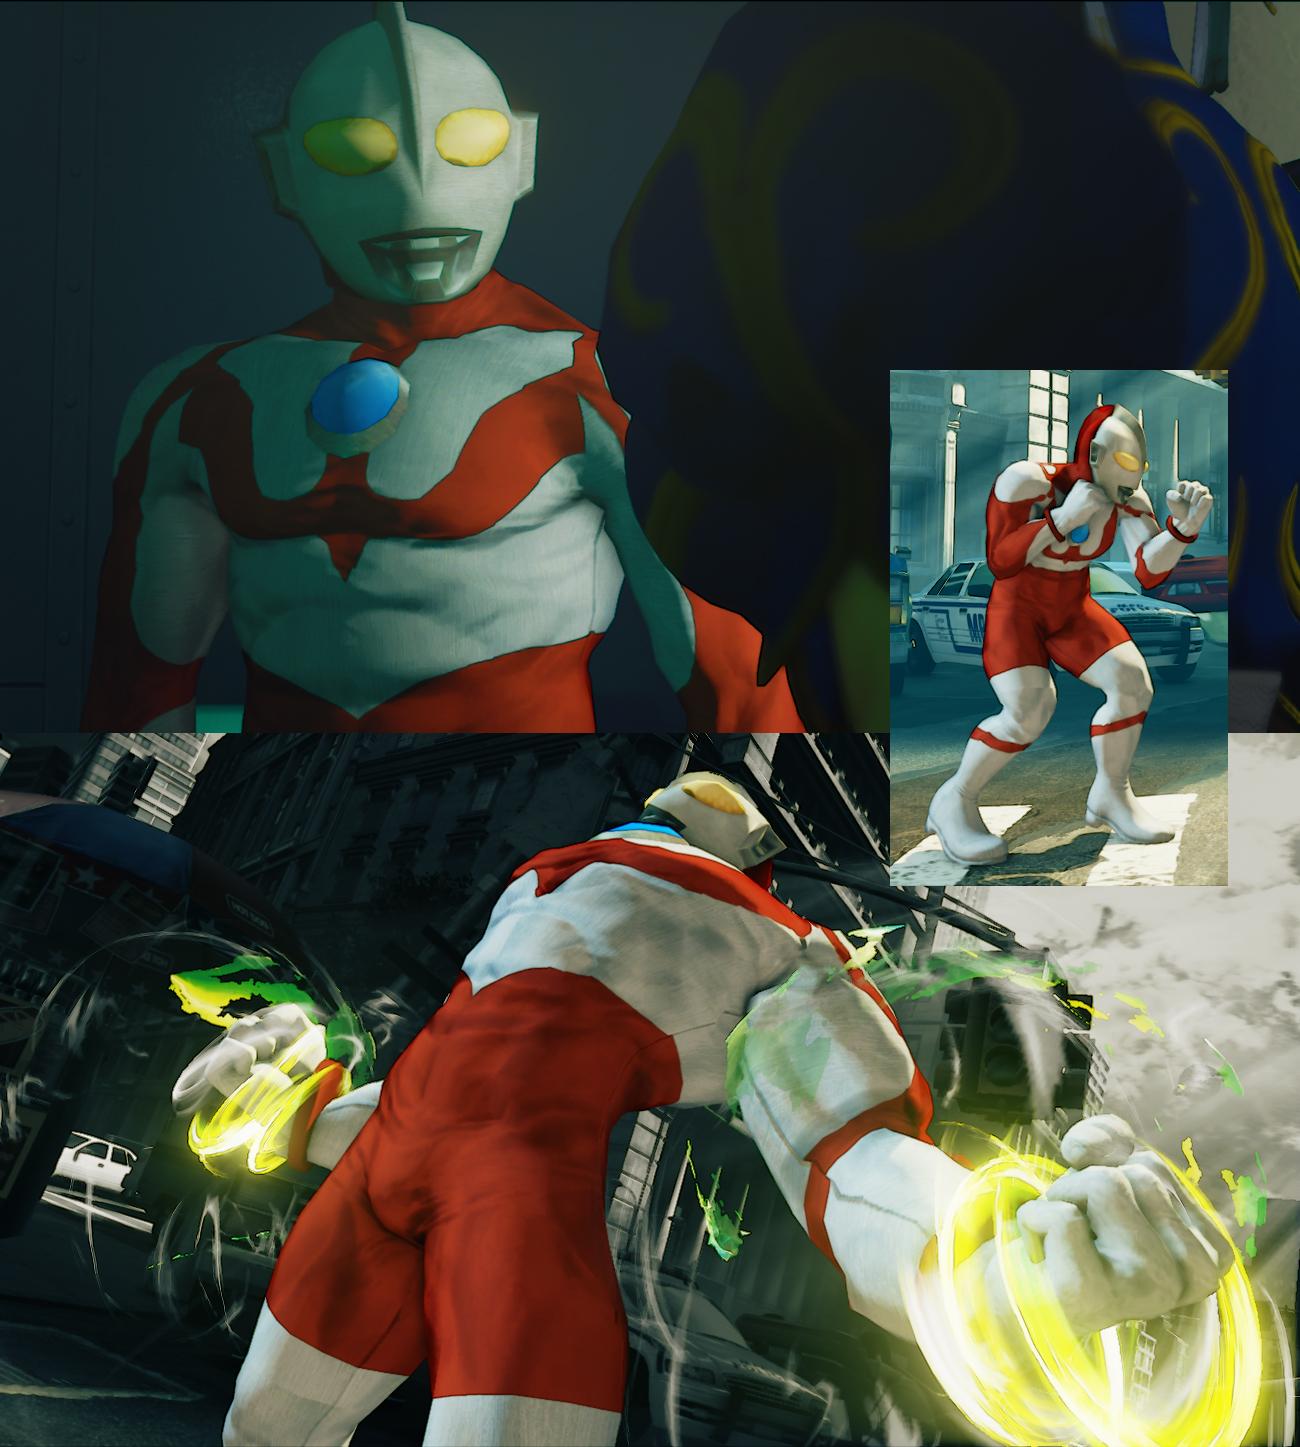 SFV Guile as Ultraman